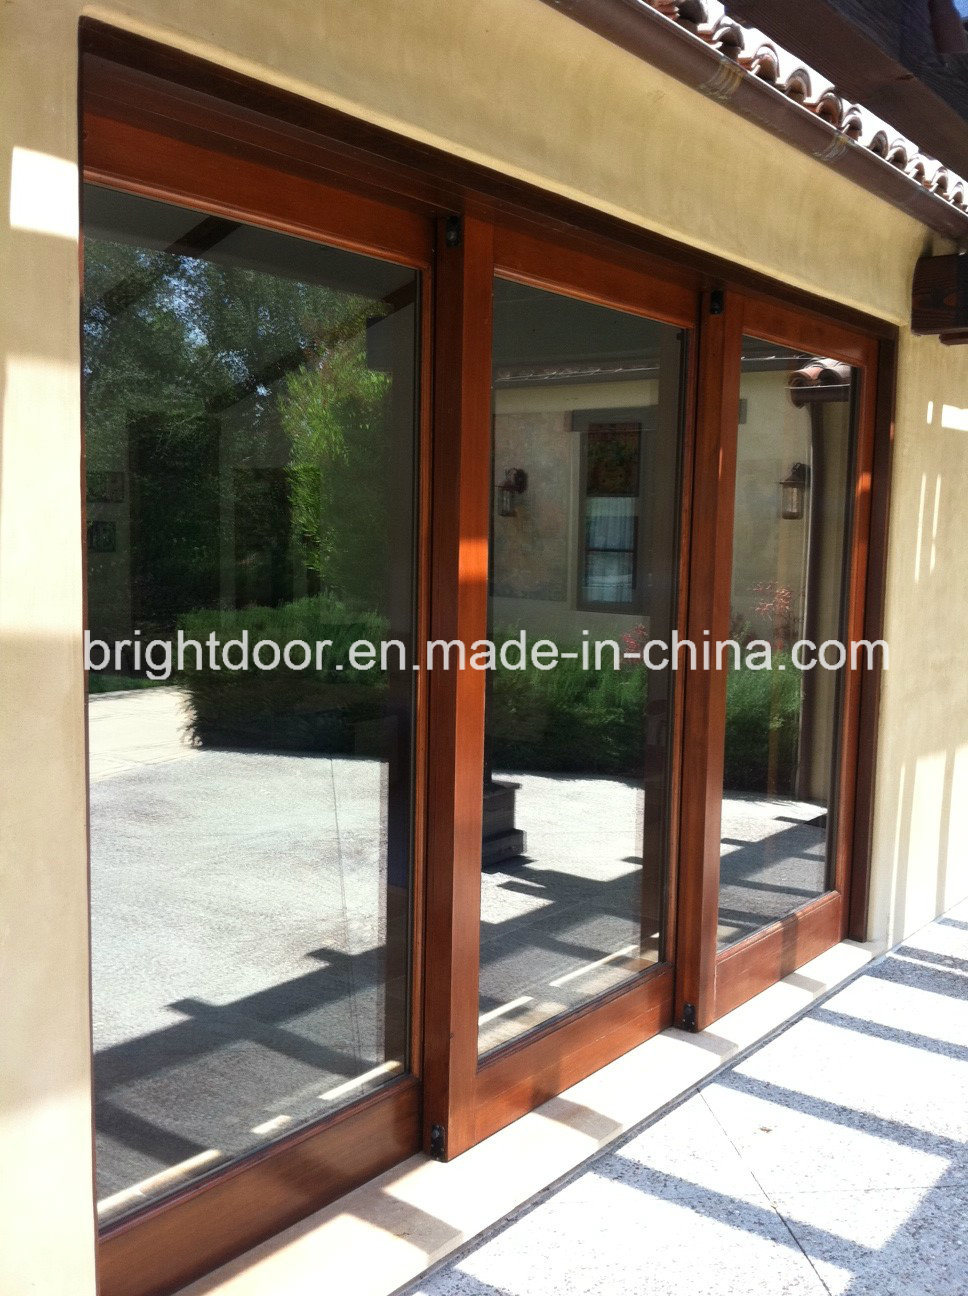 China Aluminum Door Profile 3 Paneltriple Sliding Glass Door Photos